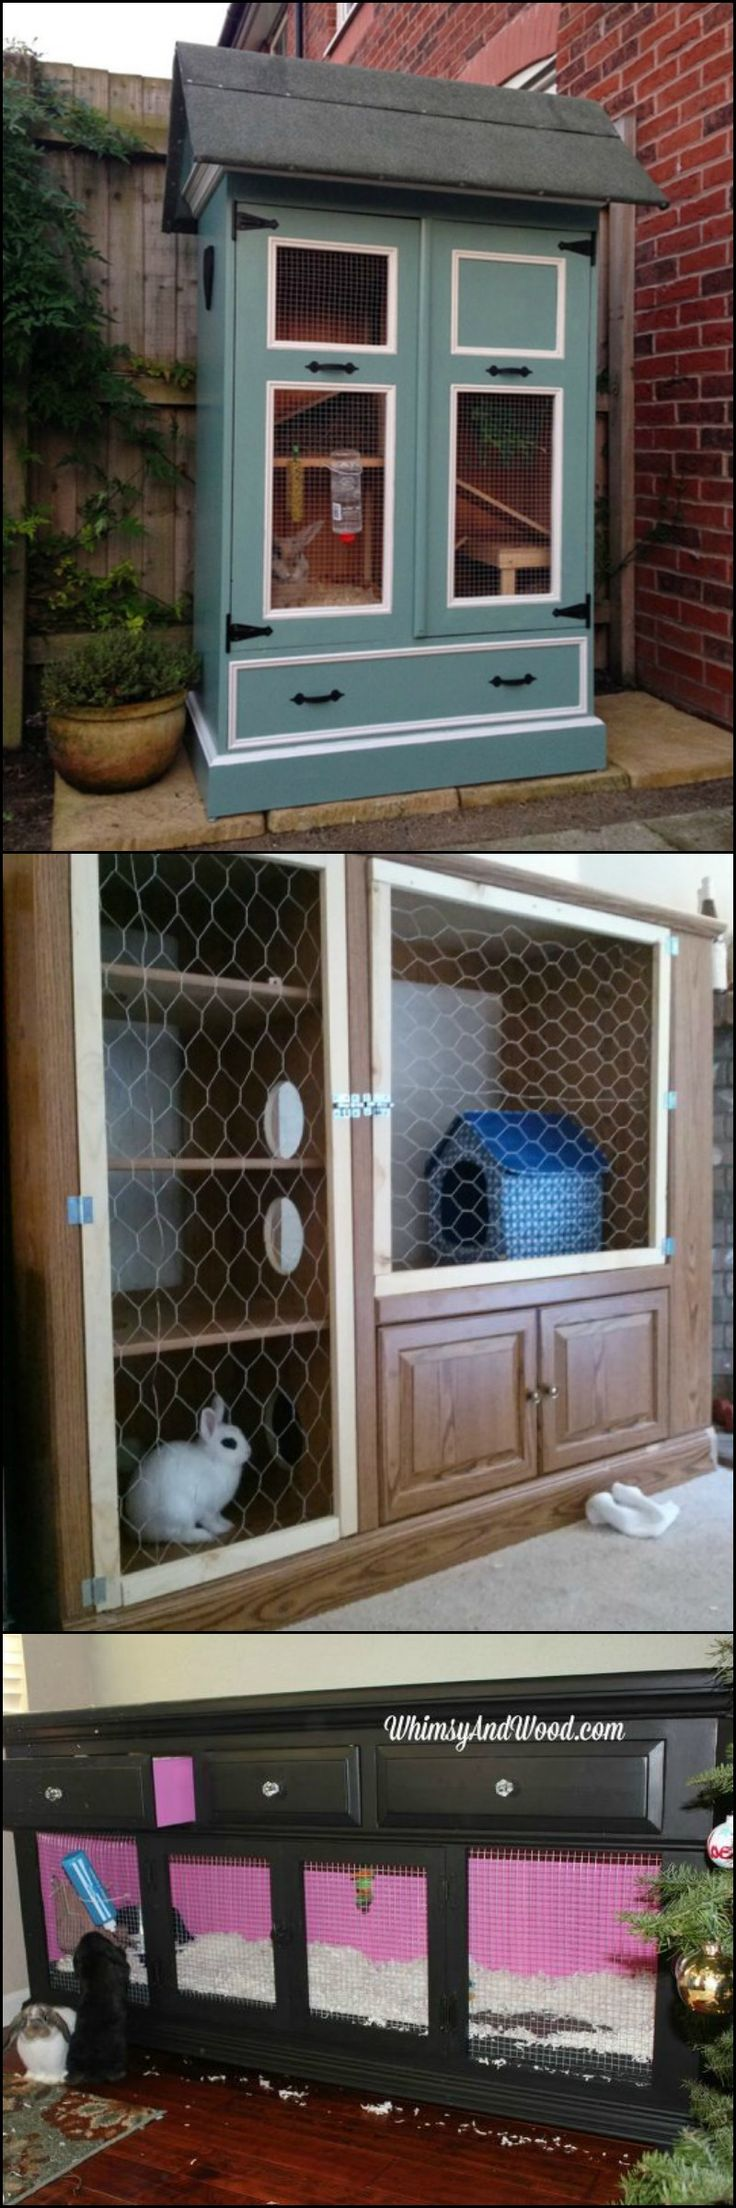 Best 25 Rabbit Cages Ideas On Pinterest Bunny Hutch Rabbit